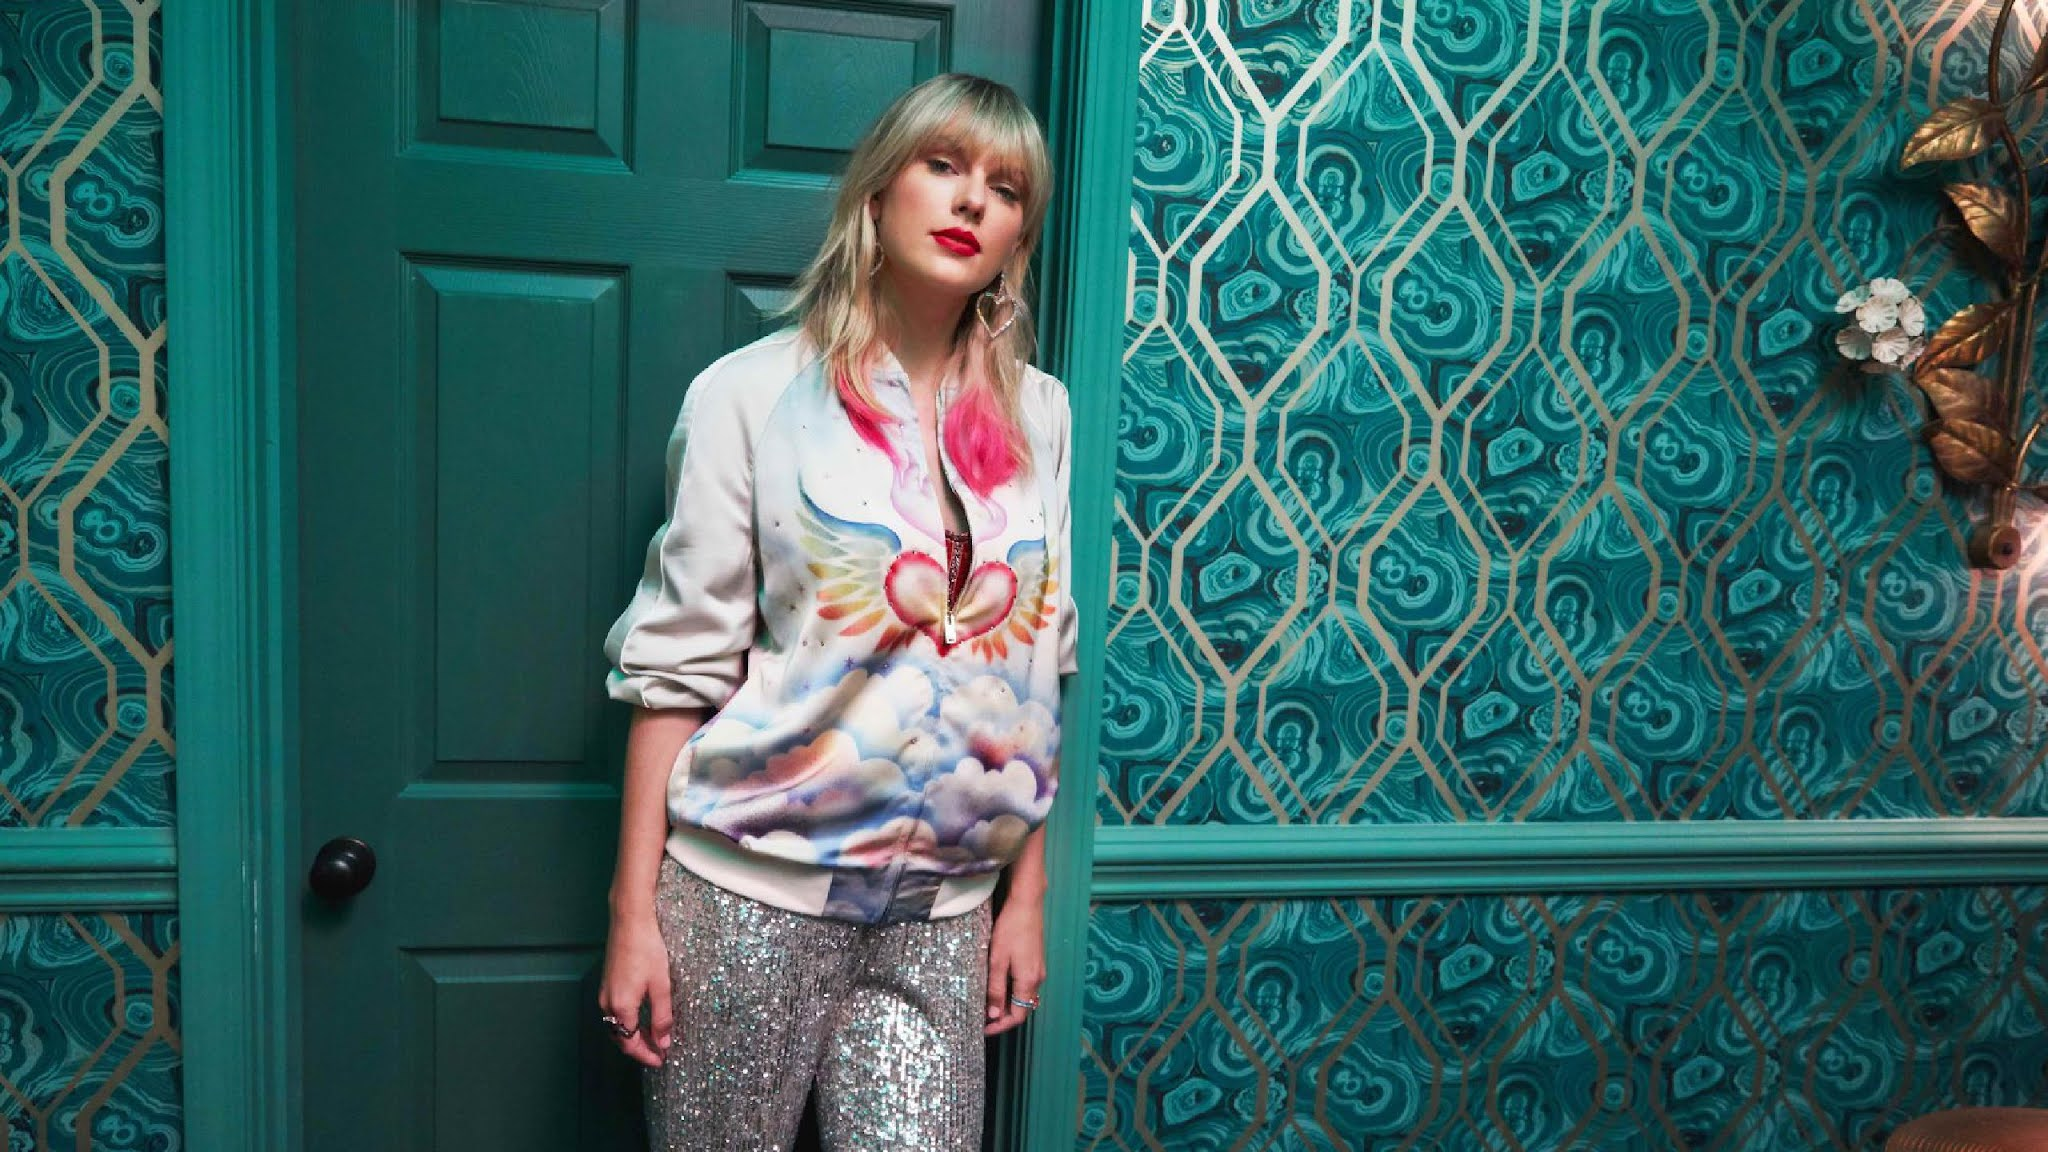 Taylor Swift hd photo